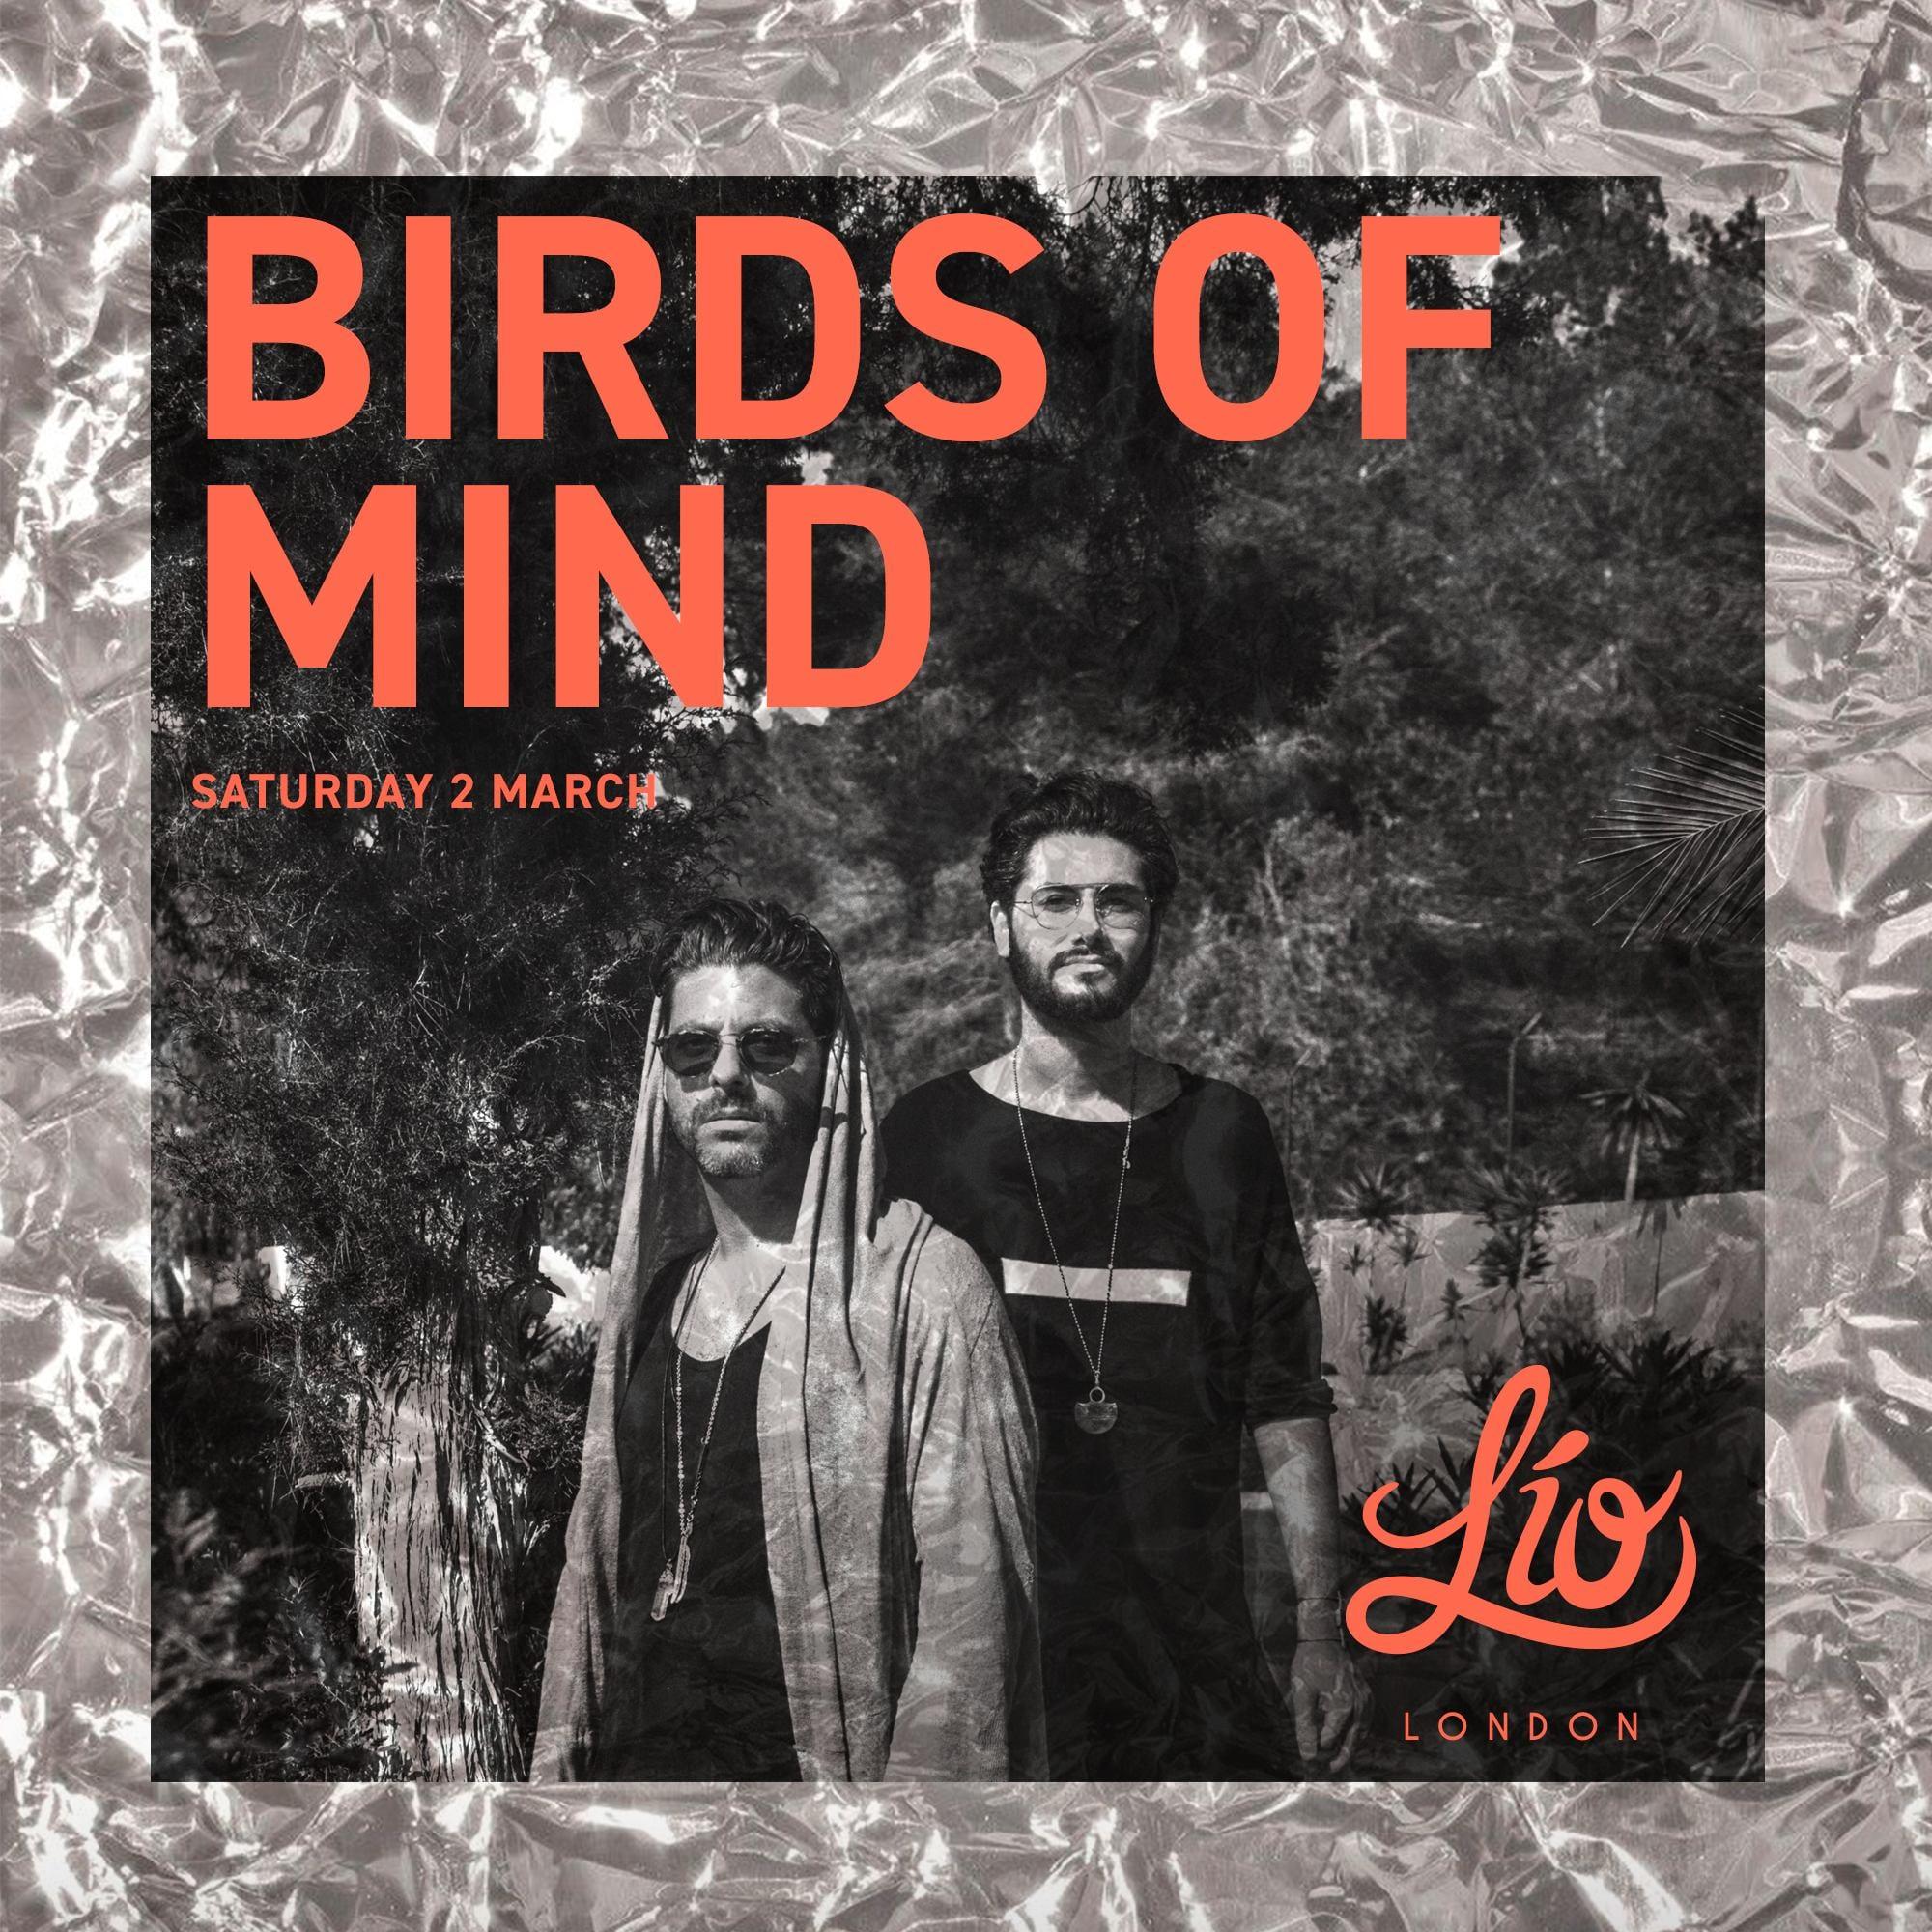 69650_1a3b-11e9-87c6-005056a6209a_lio-london-birds-insta.jpg